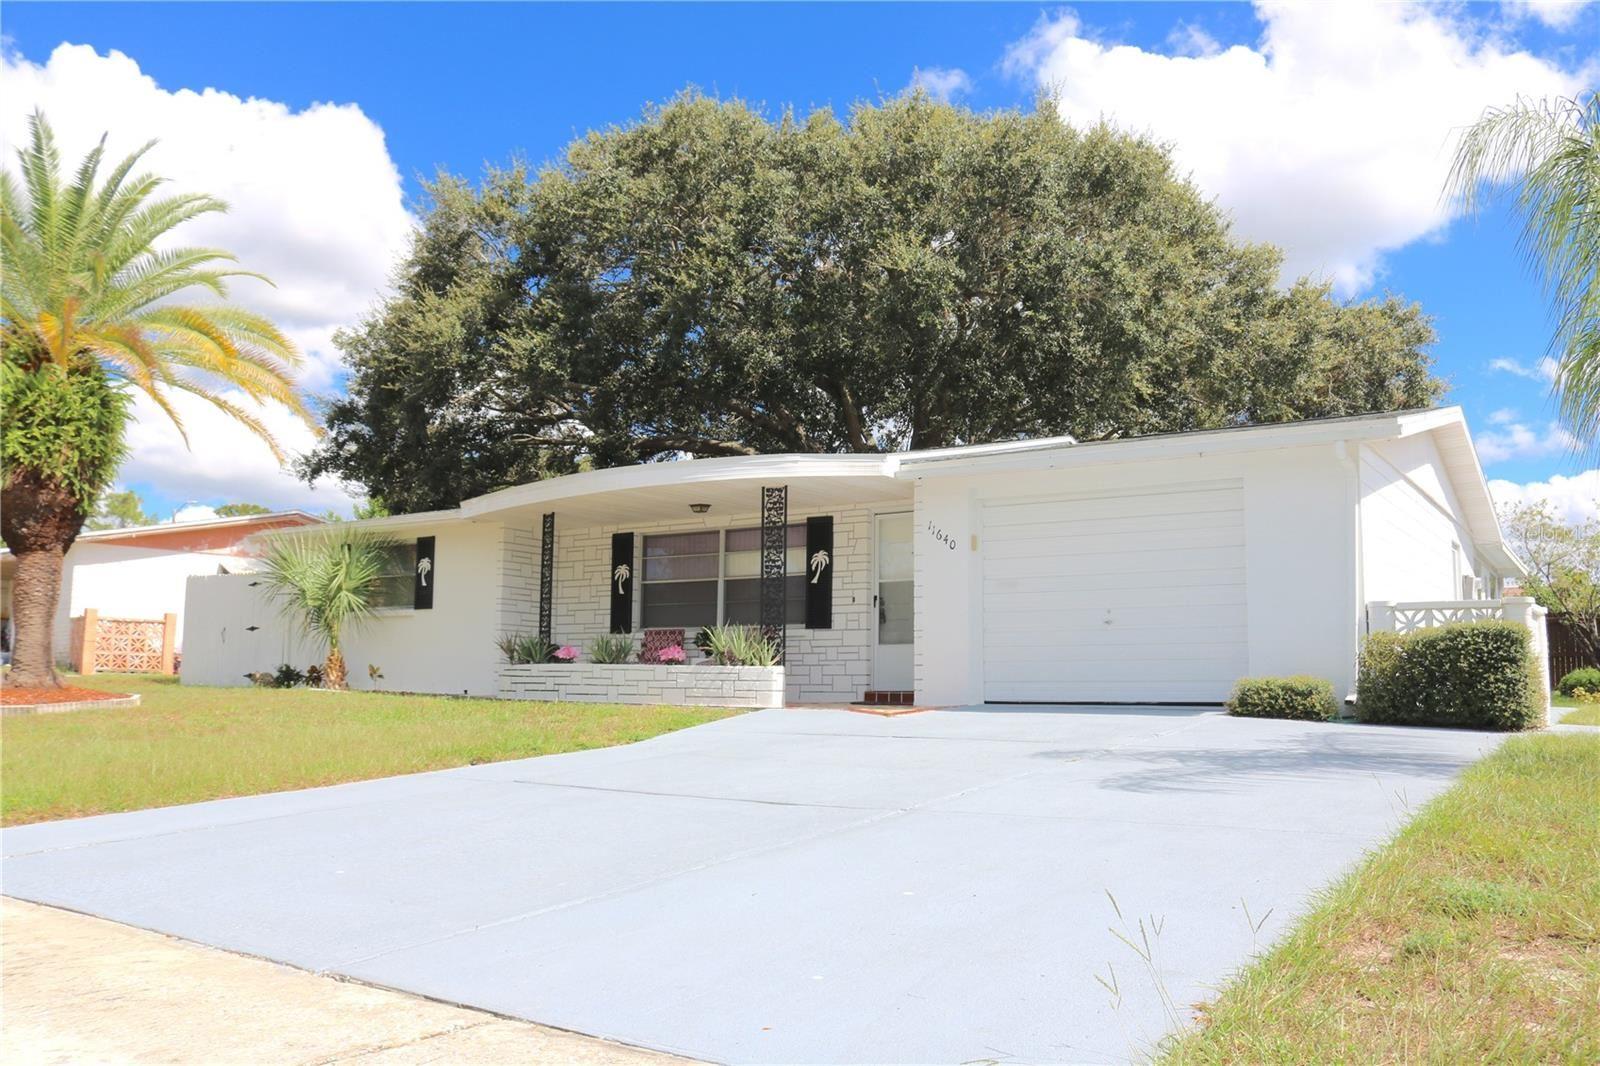 Photo for 11640 ROCKS LANE, PORT RICHEY, FL 34668 (MLS # W7838946)